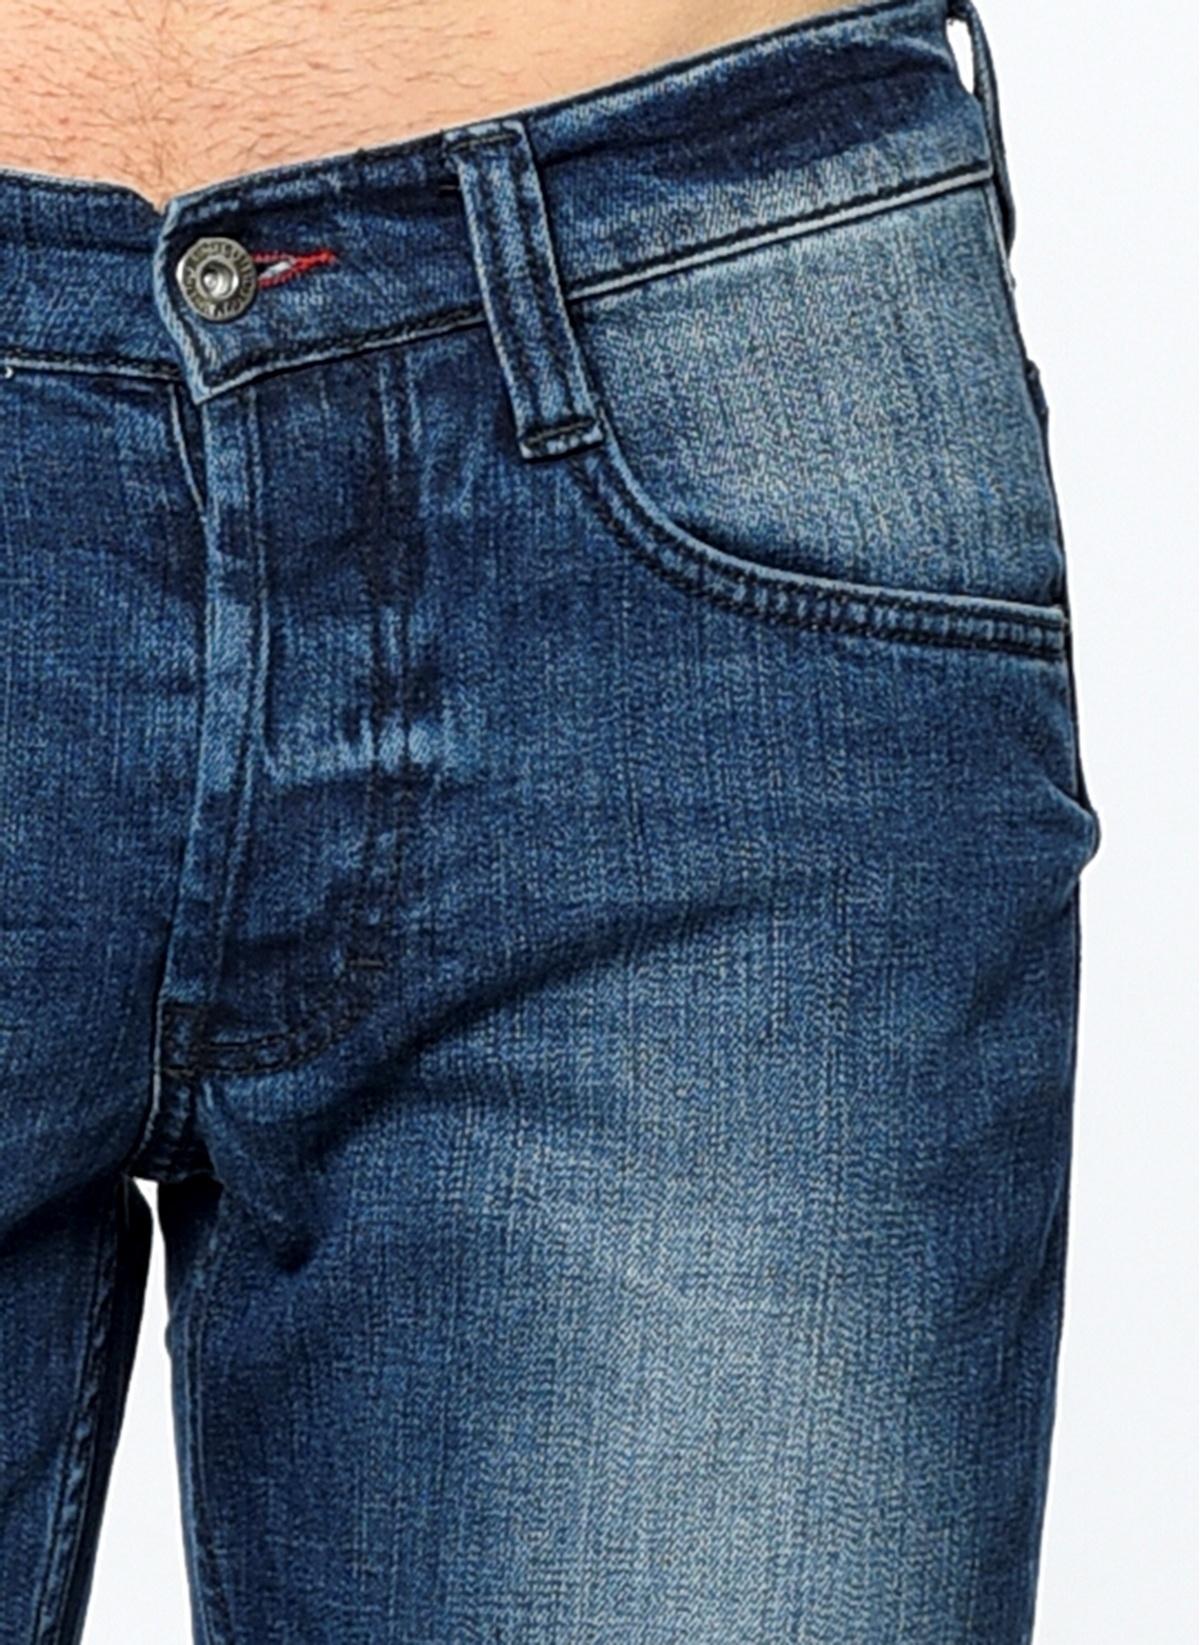 mustang erkek jean pantolon oregon tapered tinted rinse washed morhipo 15184885. Black Bedroom Furniture Sets. Home Design Ideas